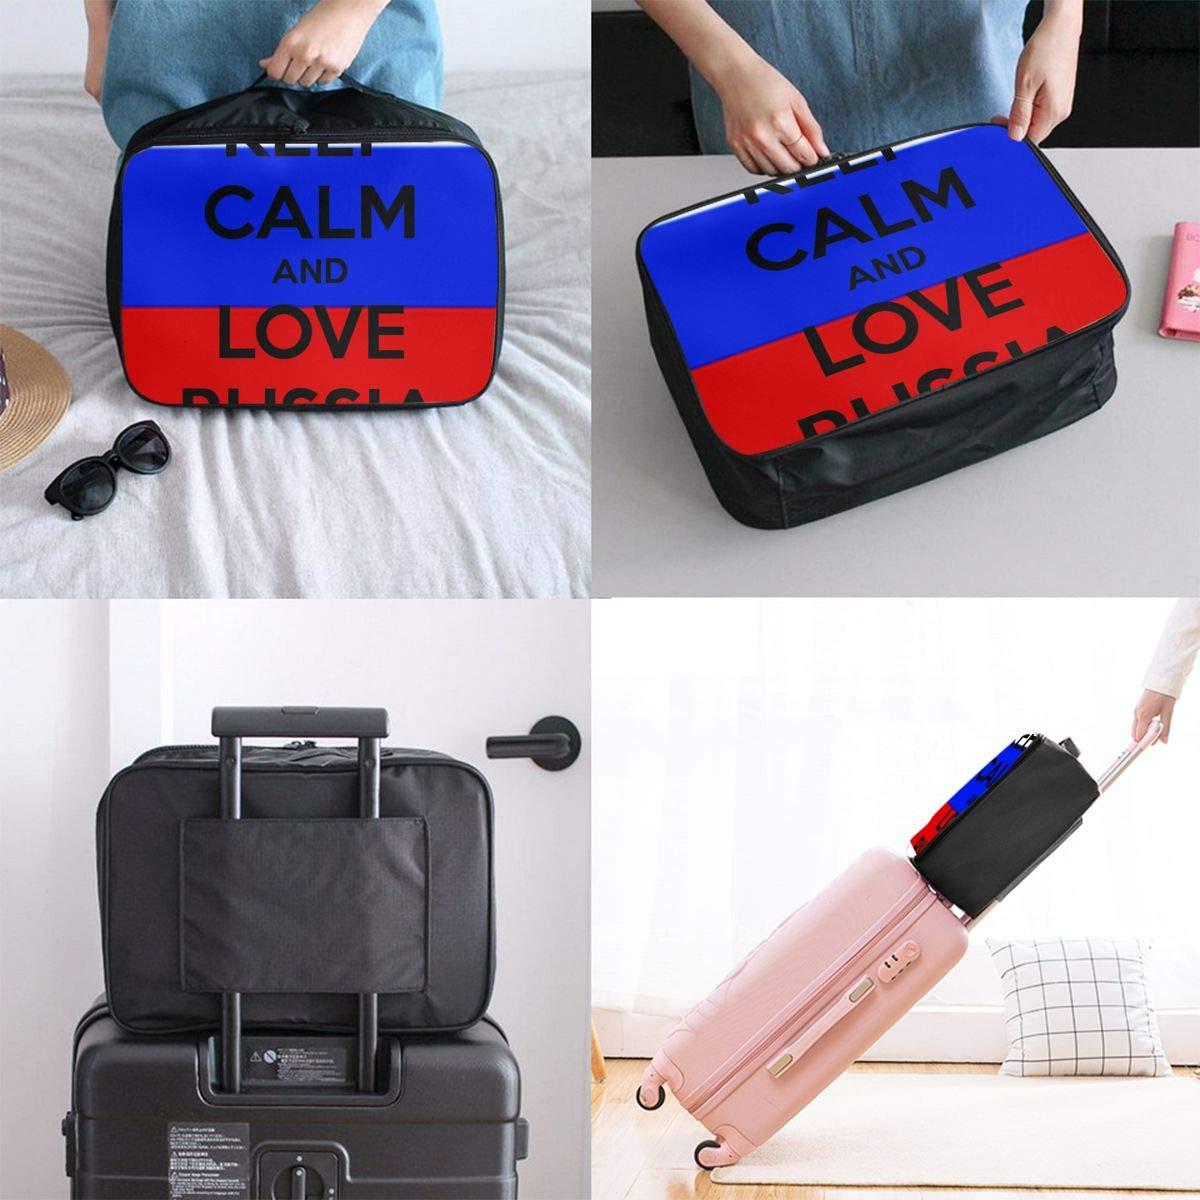 Travel Luggage Duffle Bag Lightweight Portable Handbag Keep Calm And Love Russia Large Capacity Waterproof Foldable Storage Tote